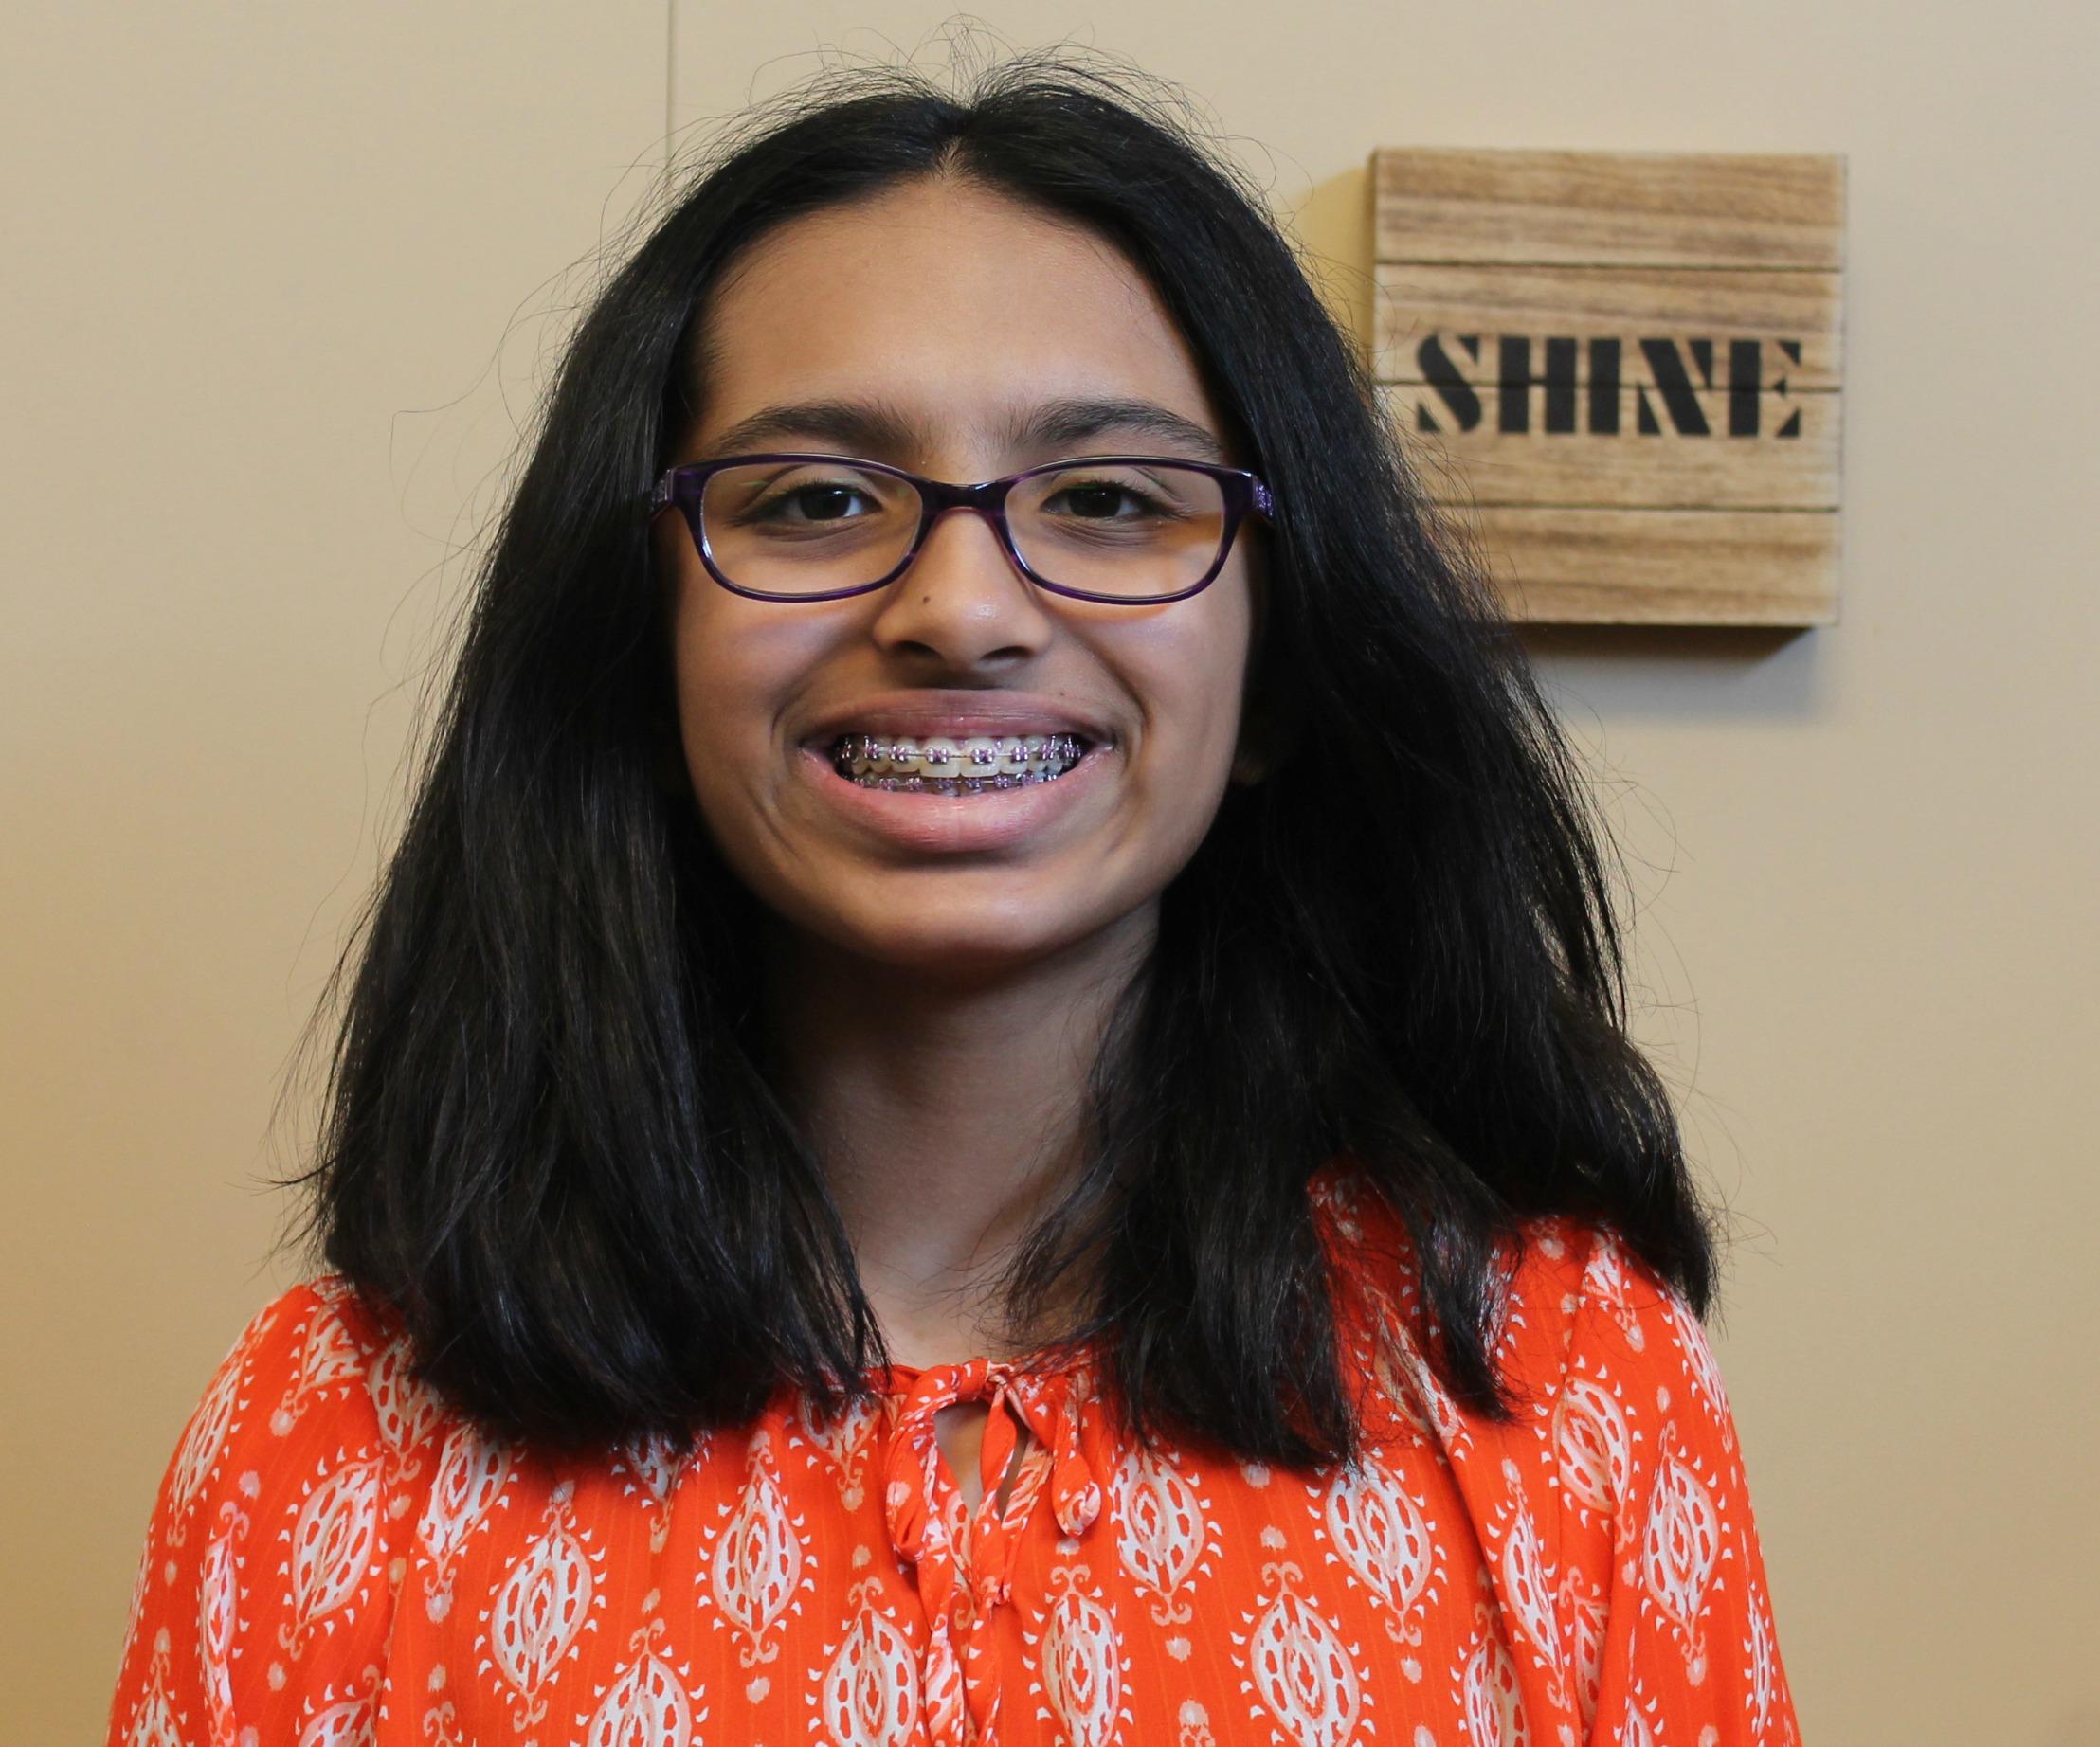 JA Student of the Month, Anika